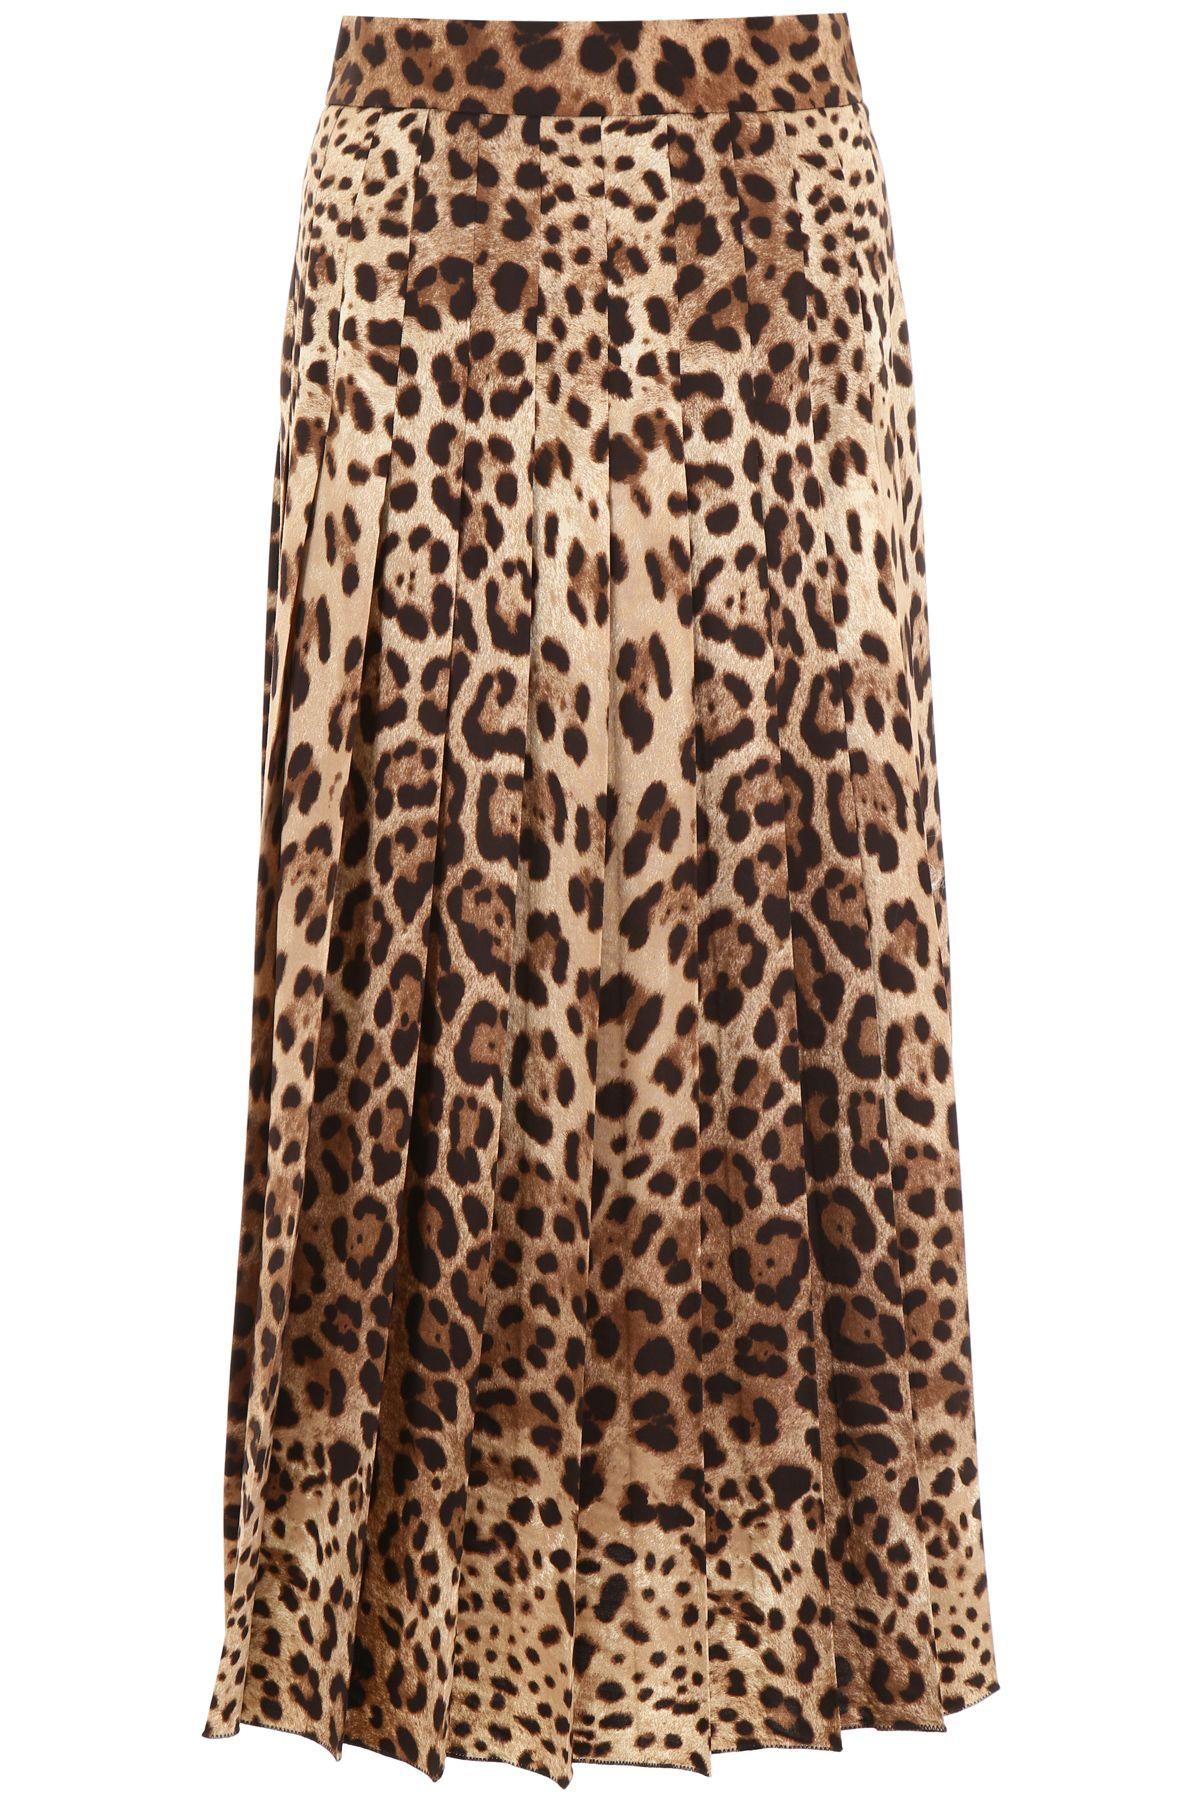 Dolce & Gabbana Leopard Print Pleated Skirt